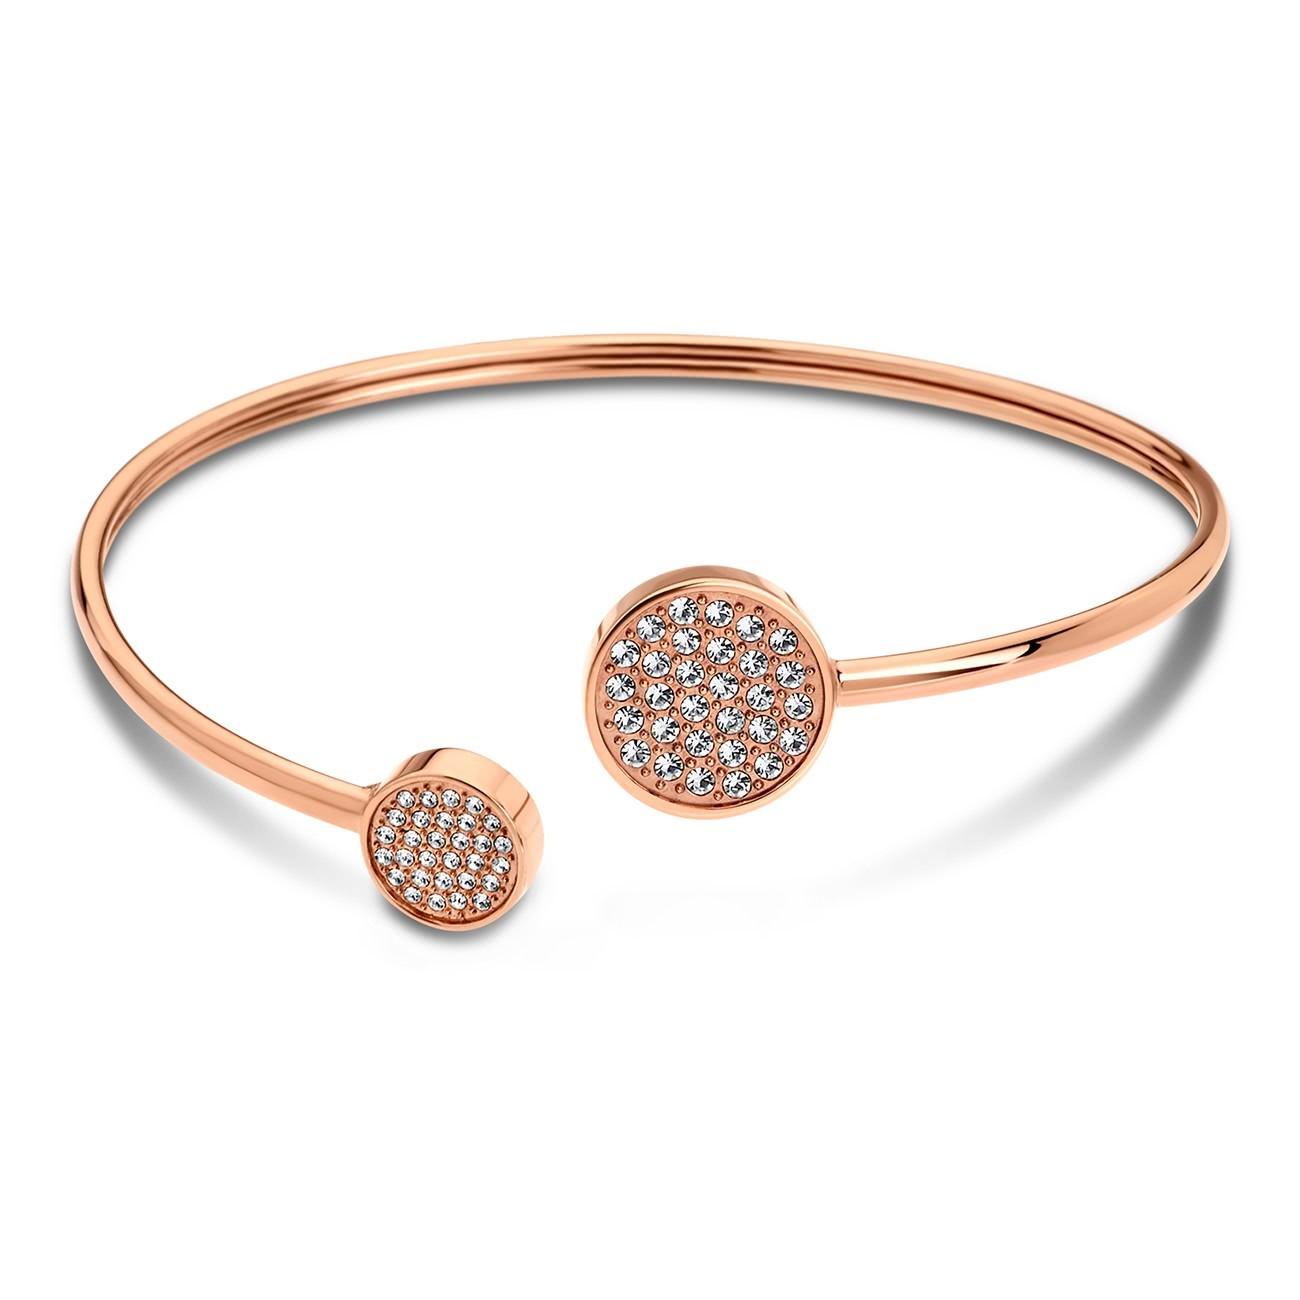 LOTUS Style Armband Damen Armreif LS1820-2/2 Edelstahl roségold JLS1820-2-2